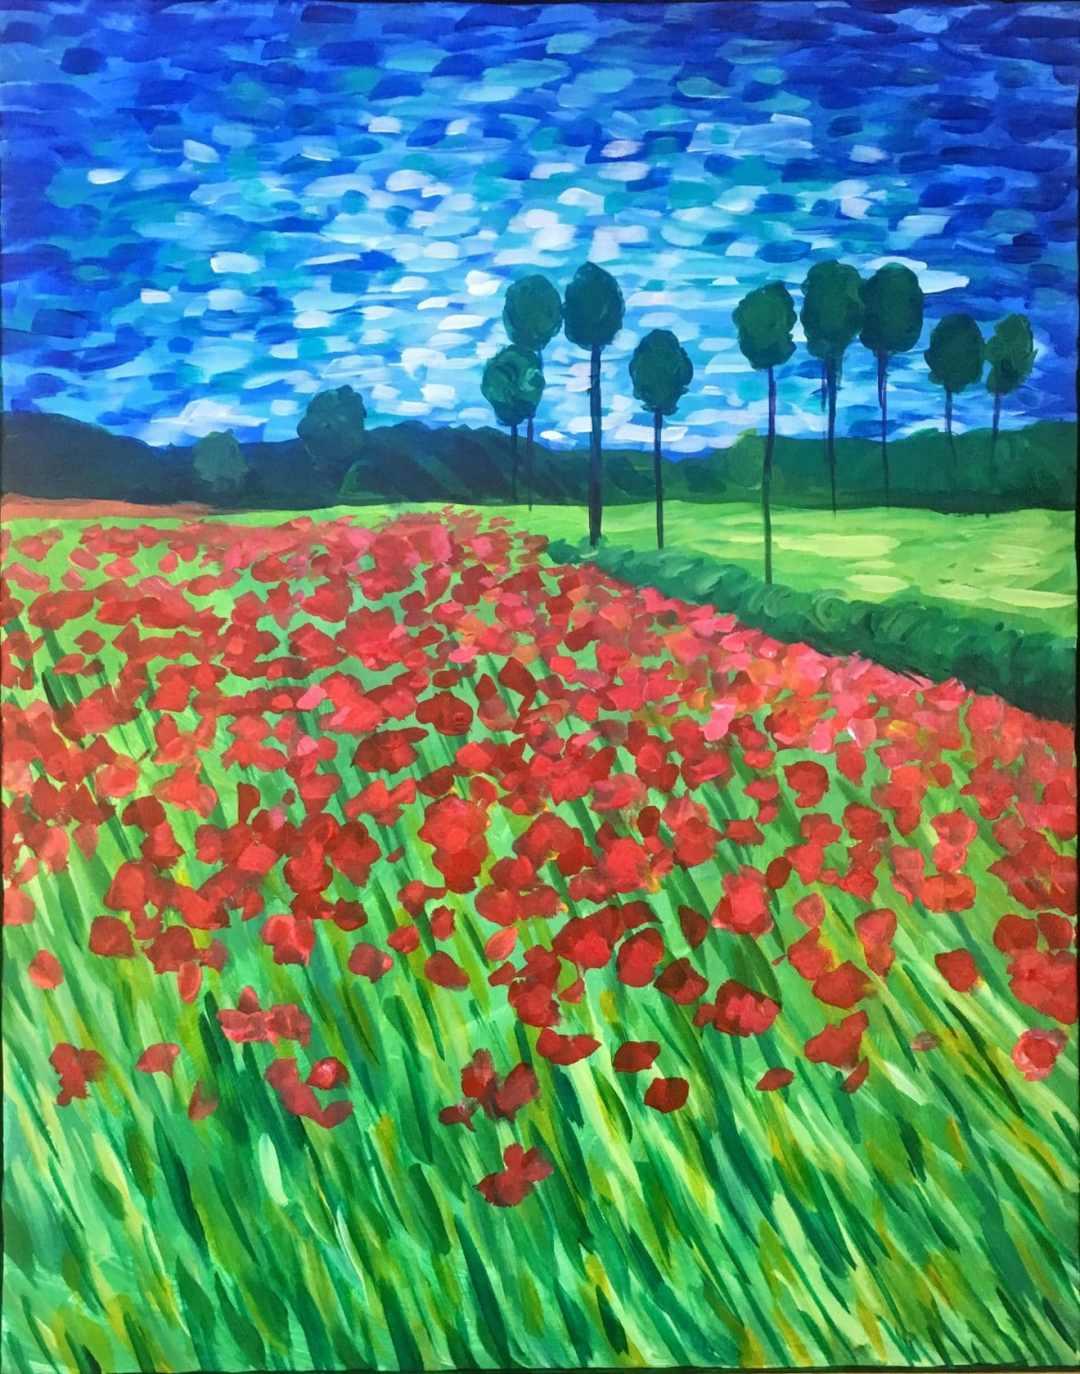 Van Gogh's Poppy Field